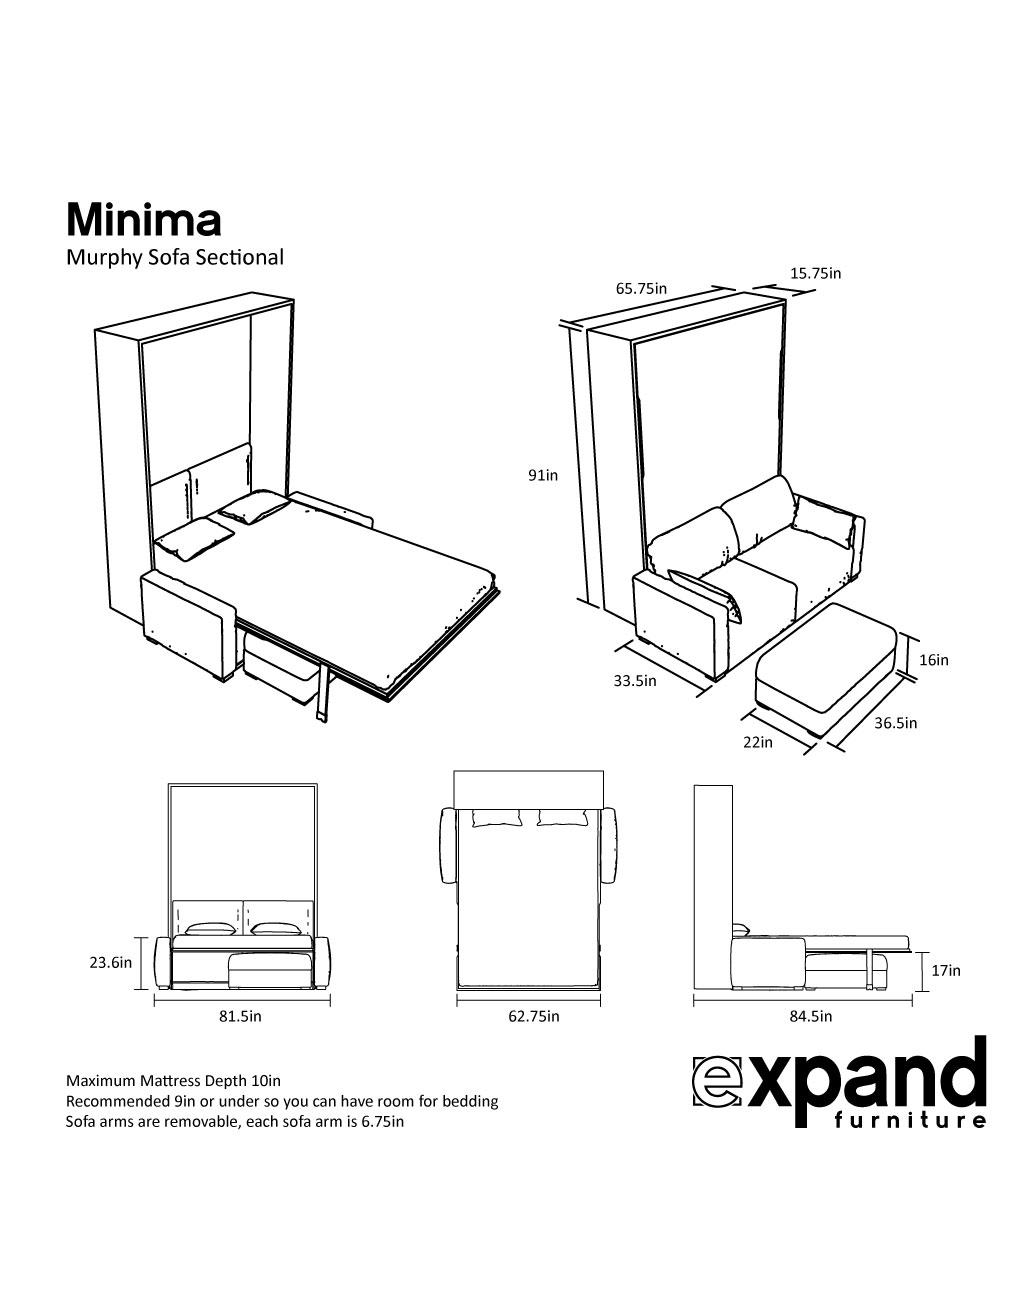 Murphysofa Minima Queen Mini Sectional Expand Furniture